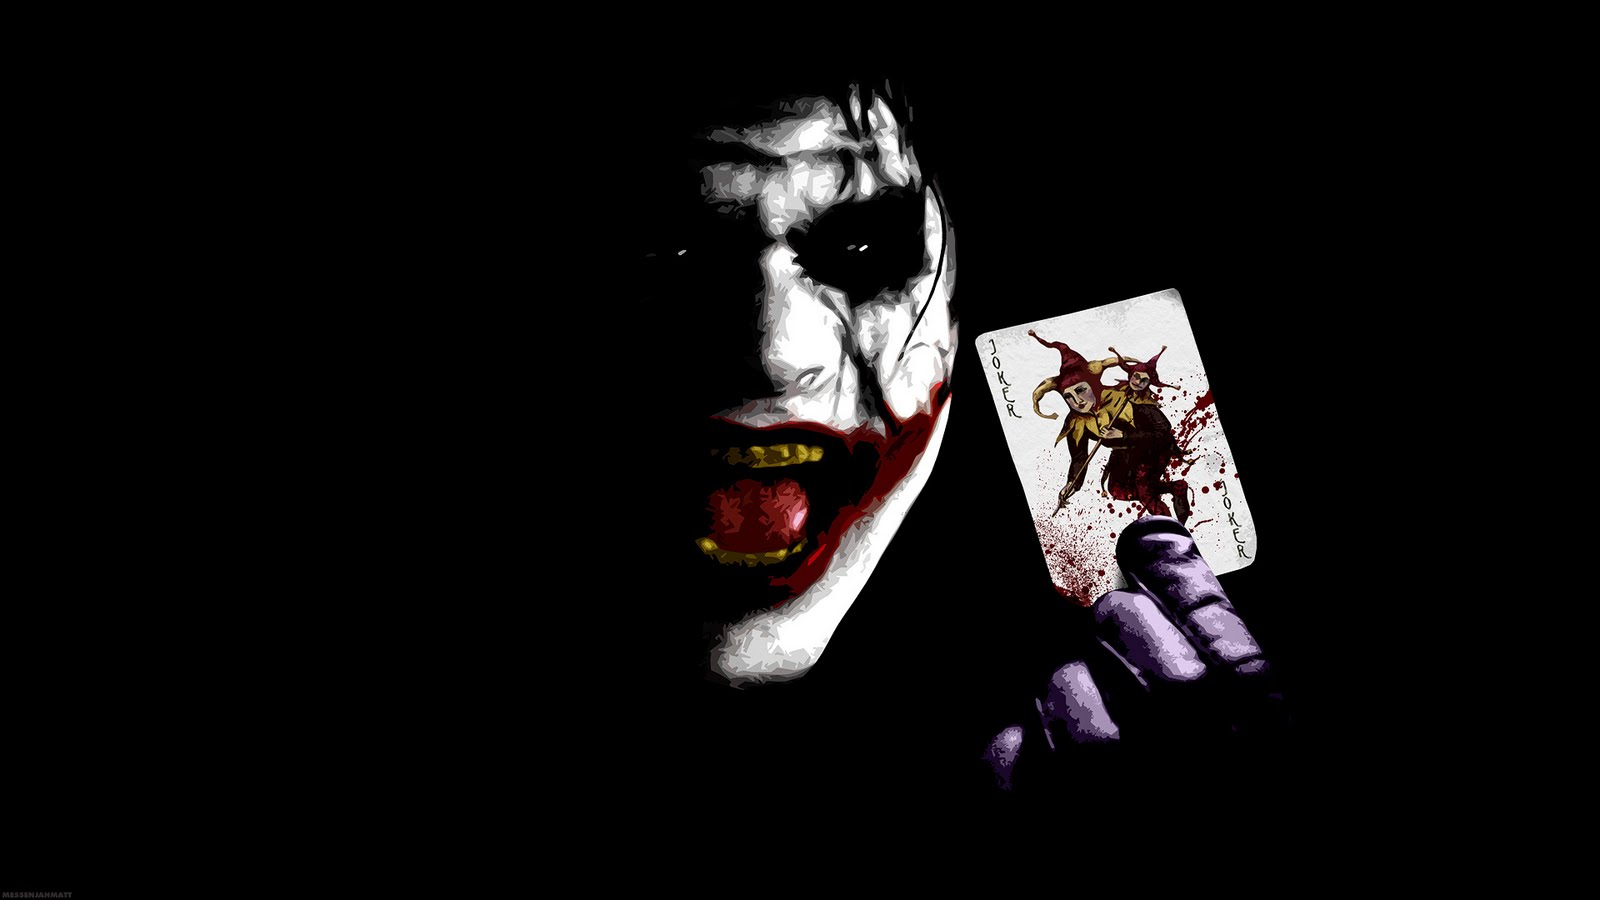 Joker photos images desktop wallpapers 19201080 Black Background 1600x900